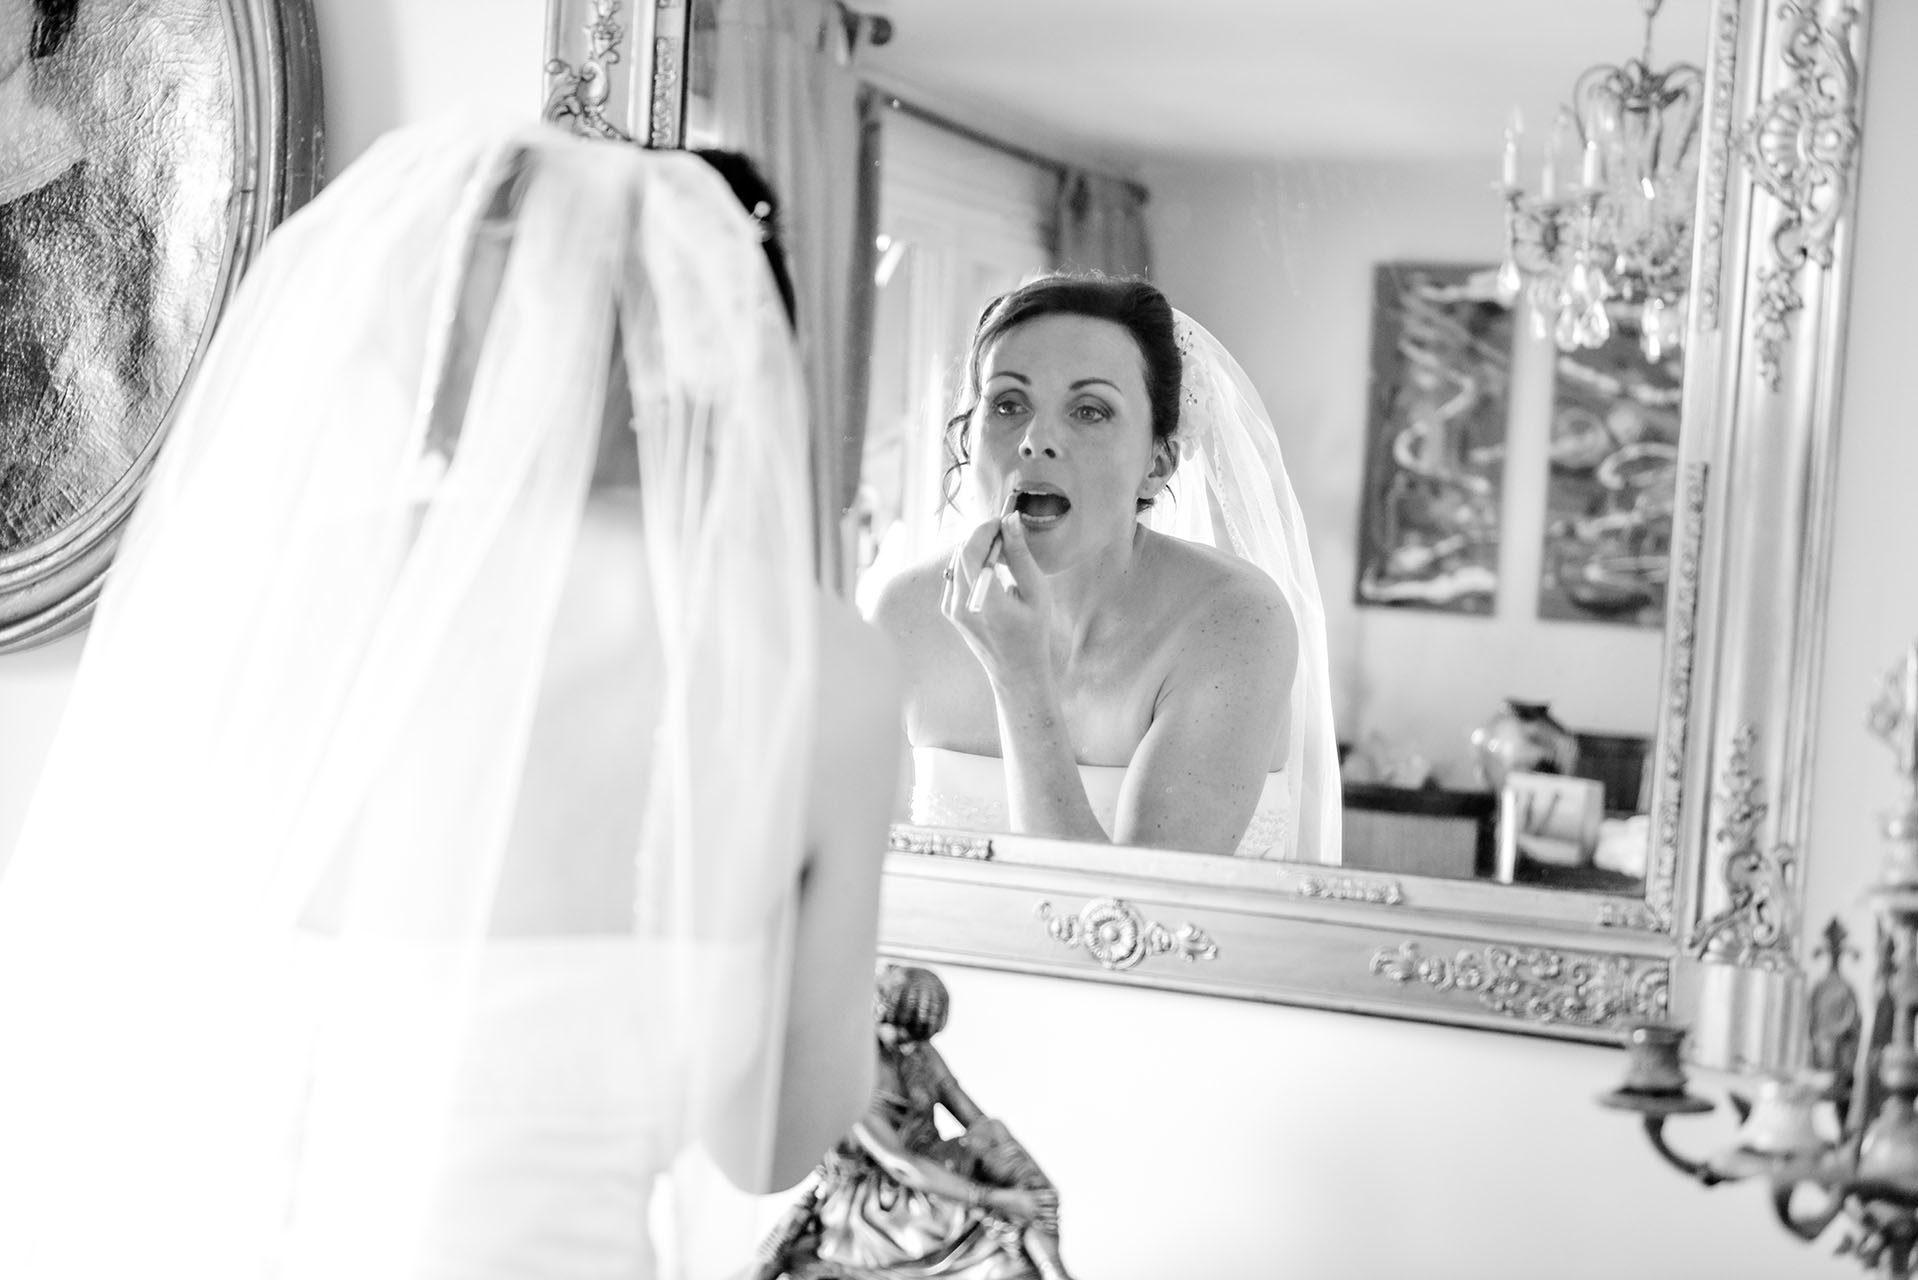 photographe-mariage-maya-angelsen-ile-de-france-essonne